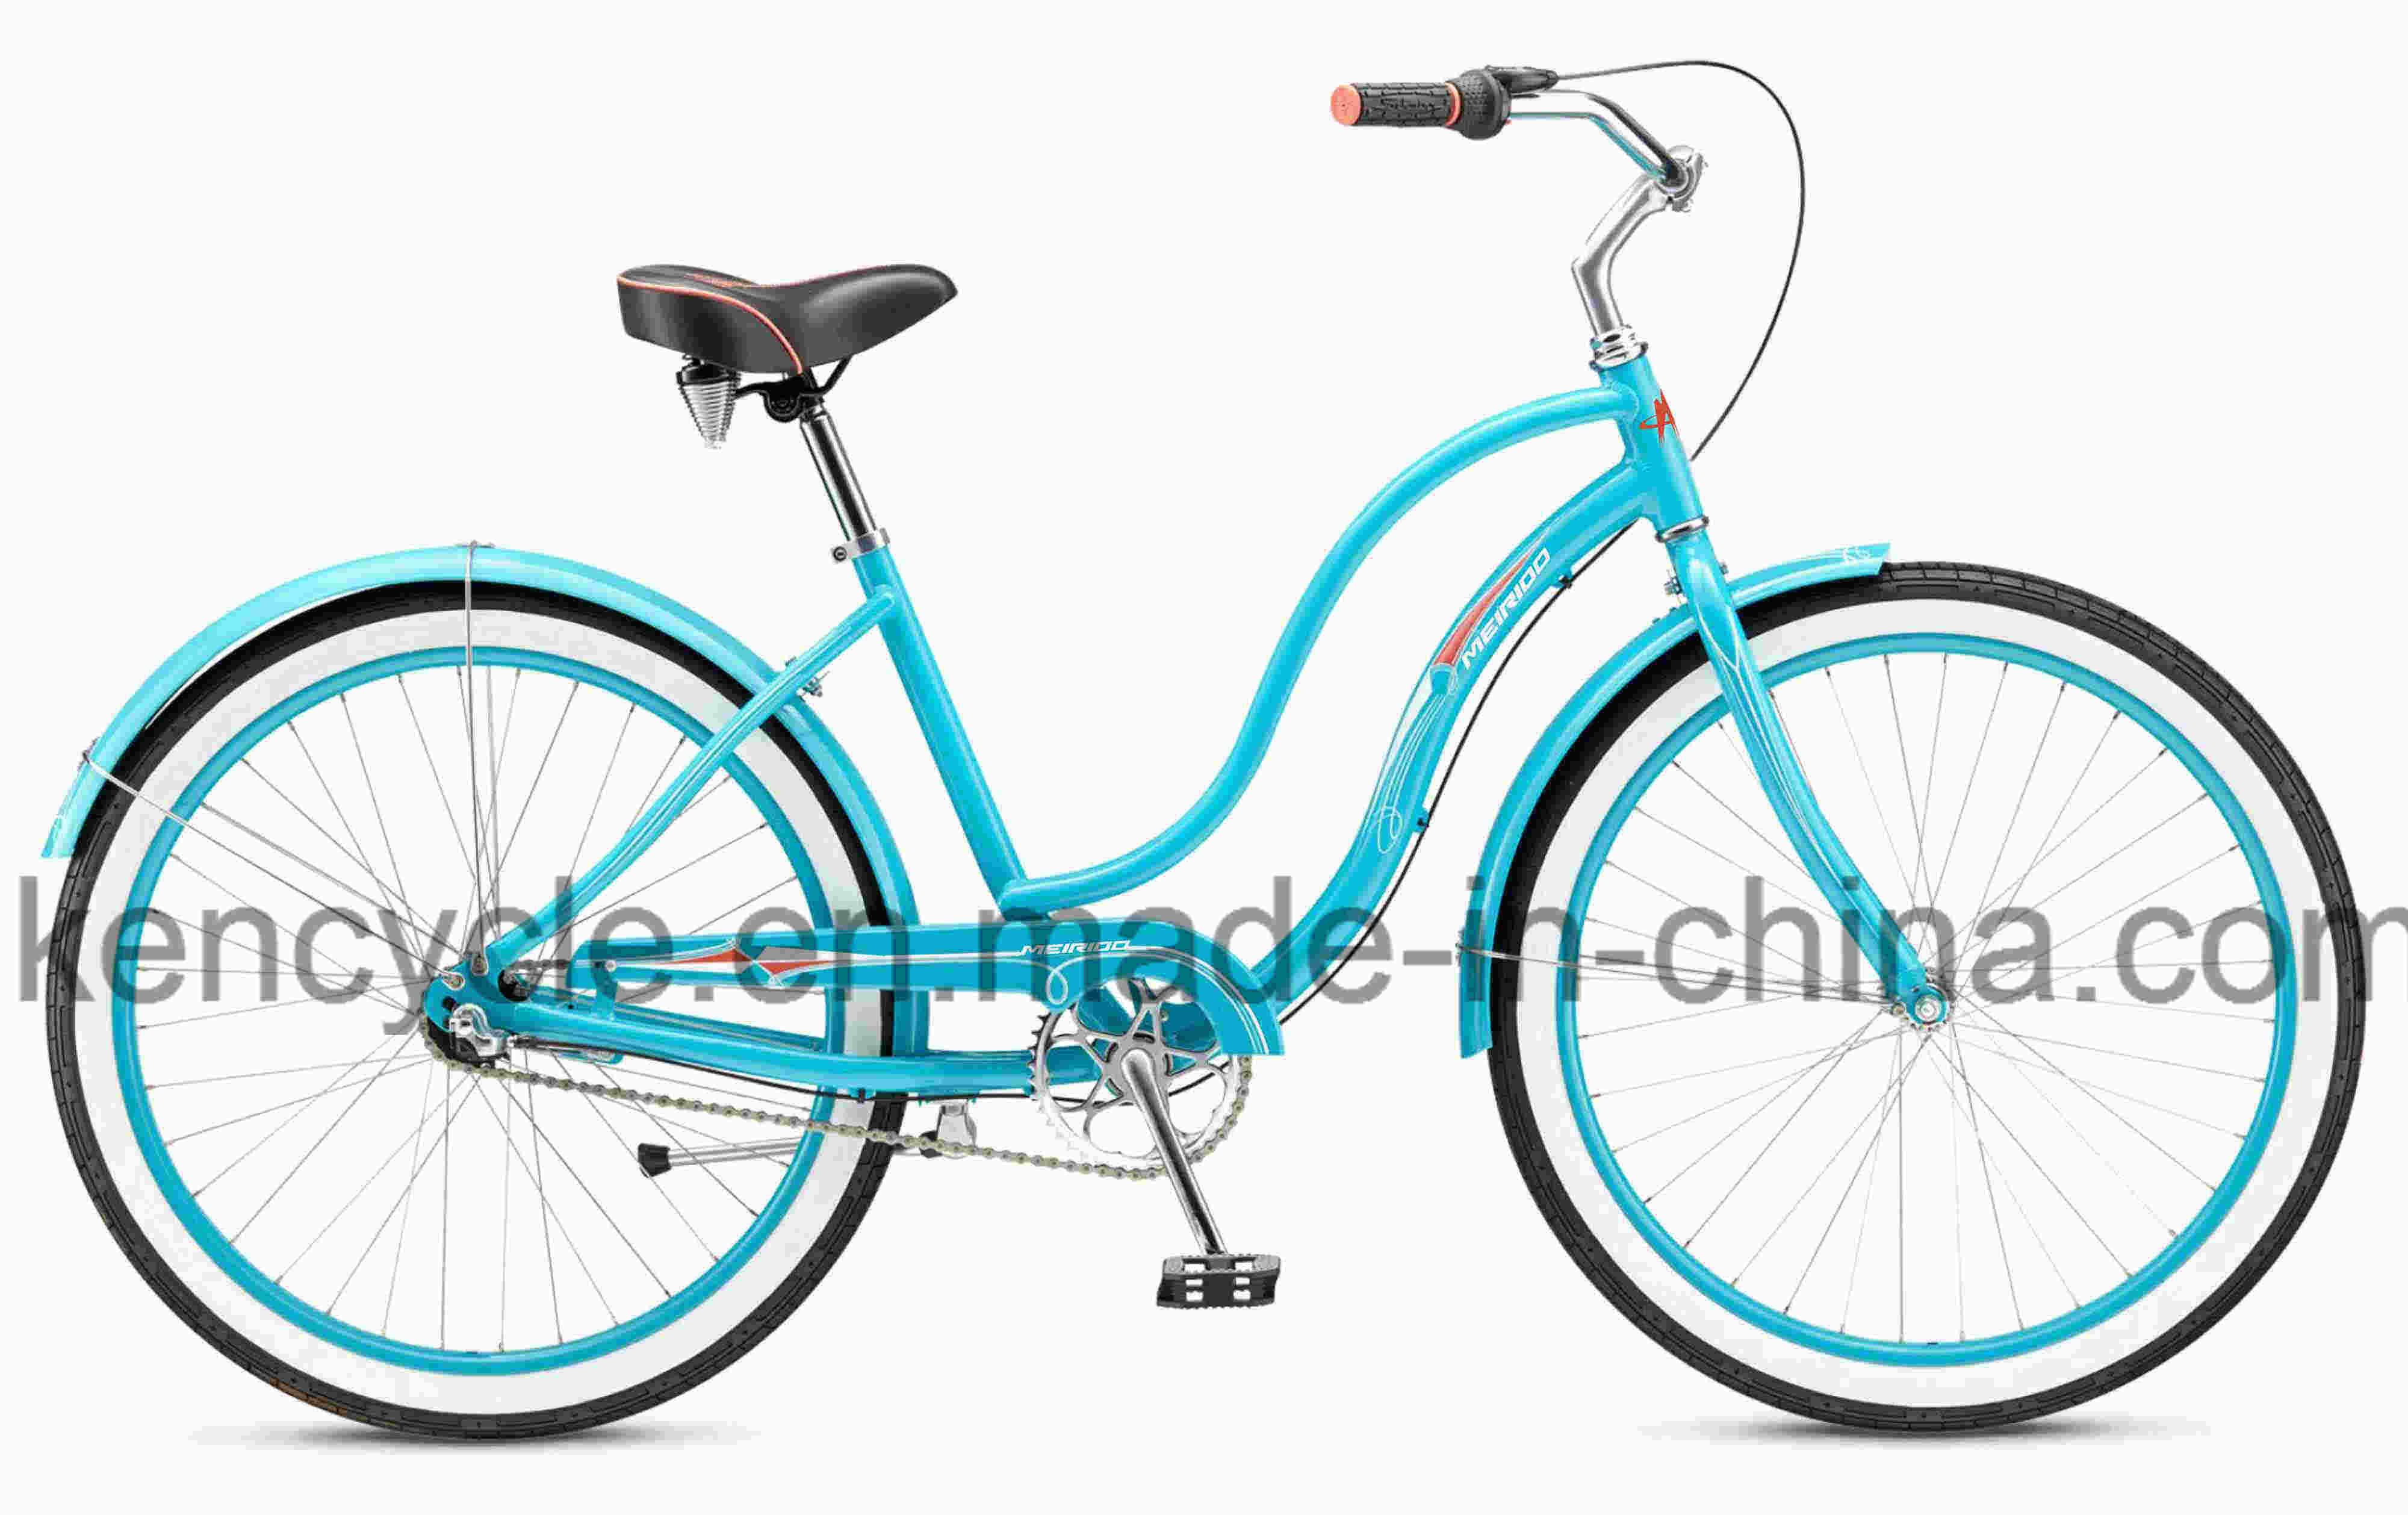 Inner 3 Speed Beach Cruiser Bike/Adult Beach Cruiser Bike/Standard Beach Cruiser Chopper Bike